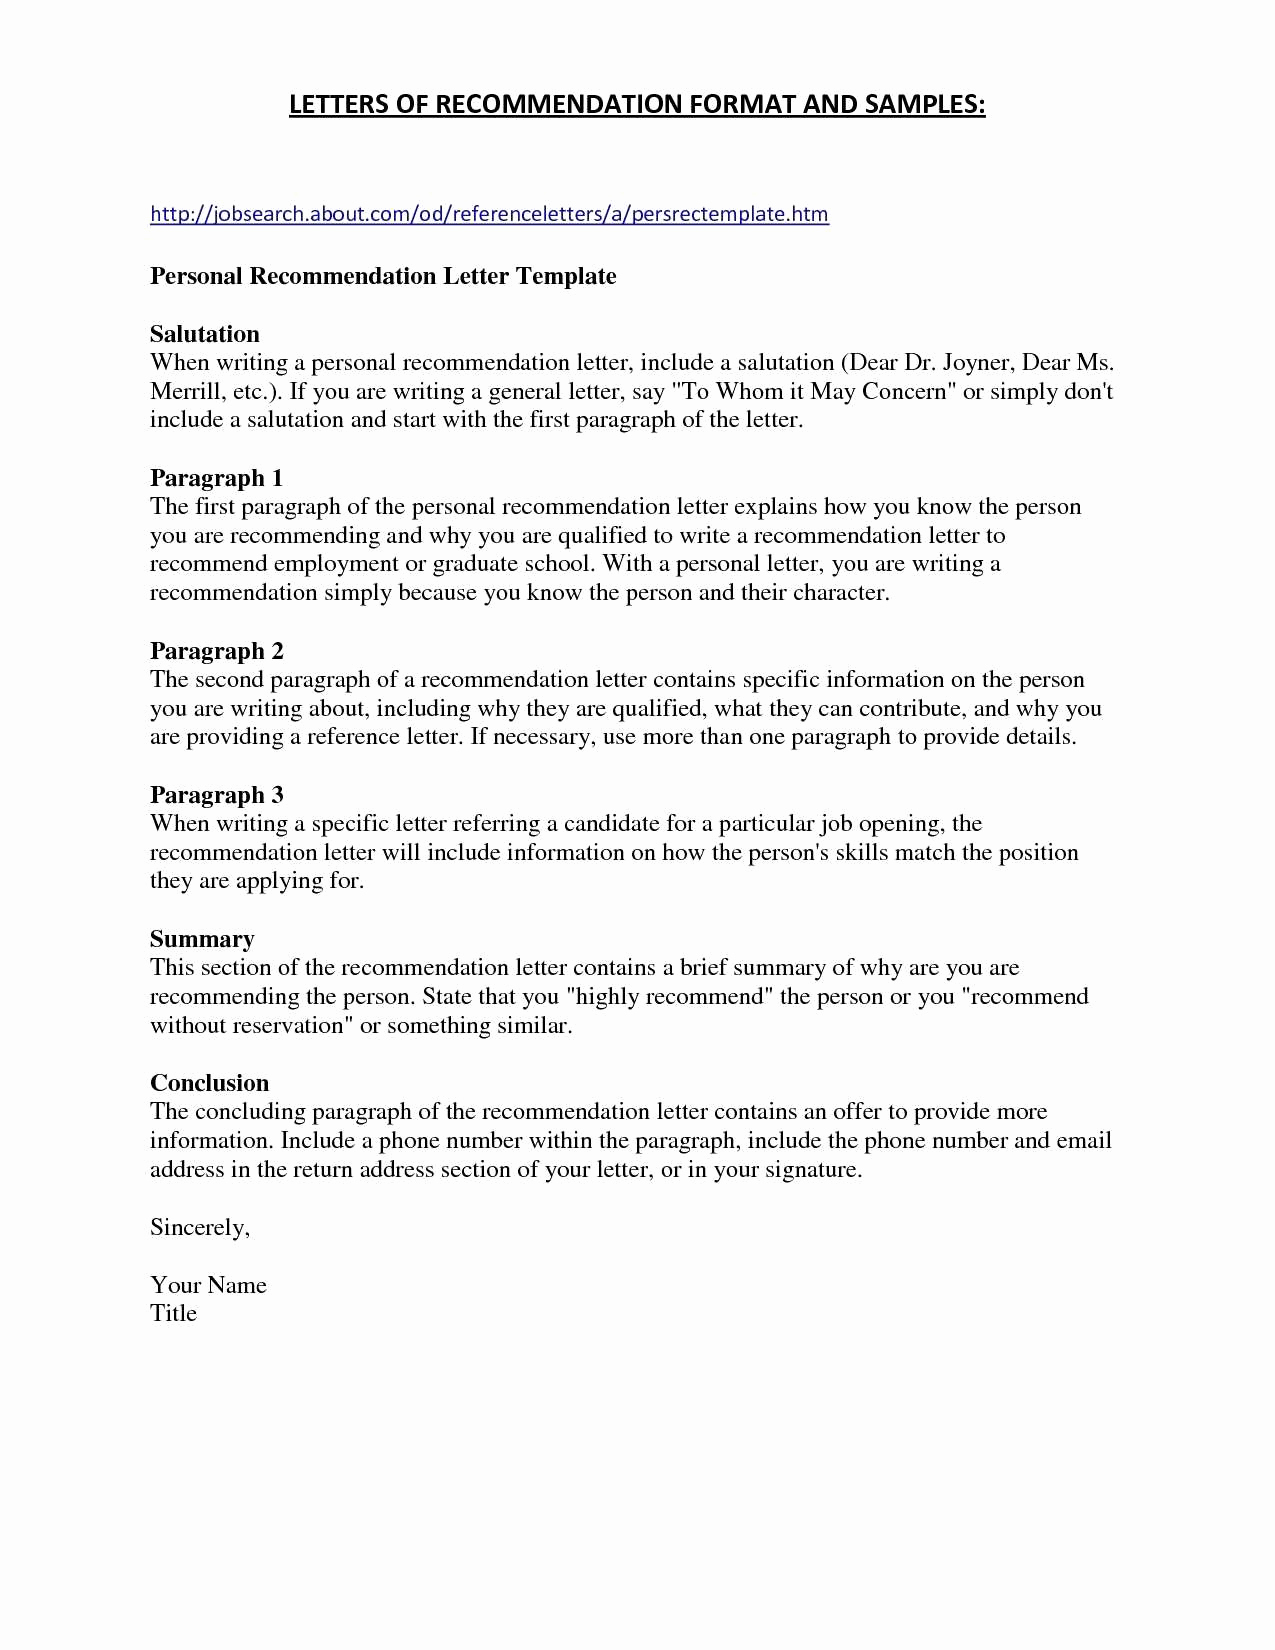 Termination Of Rental Agreement Letter Template - Rental Agreements Templates Awesome Lease Termination Letter